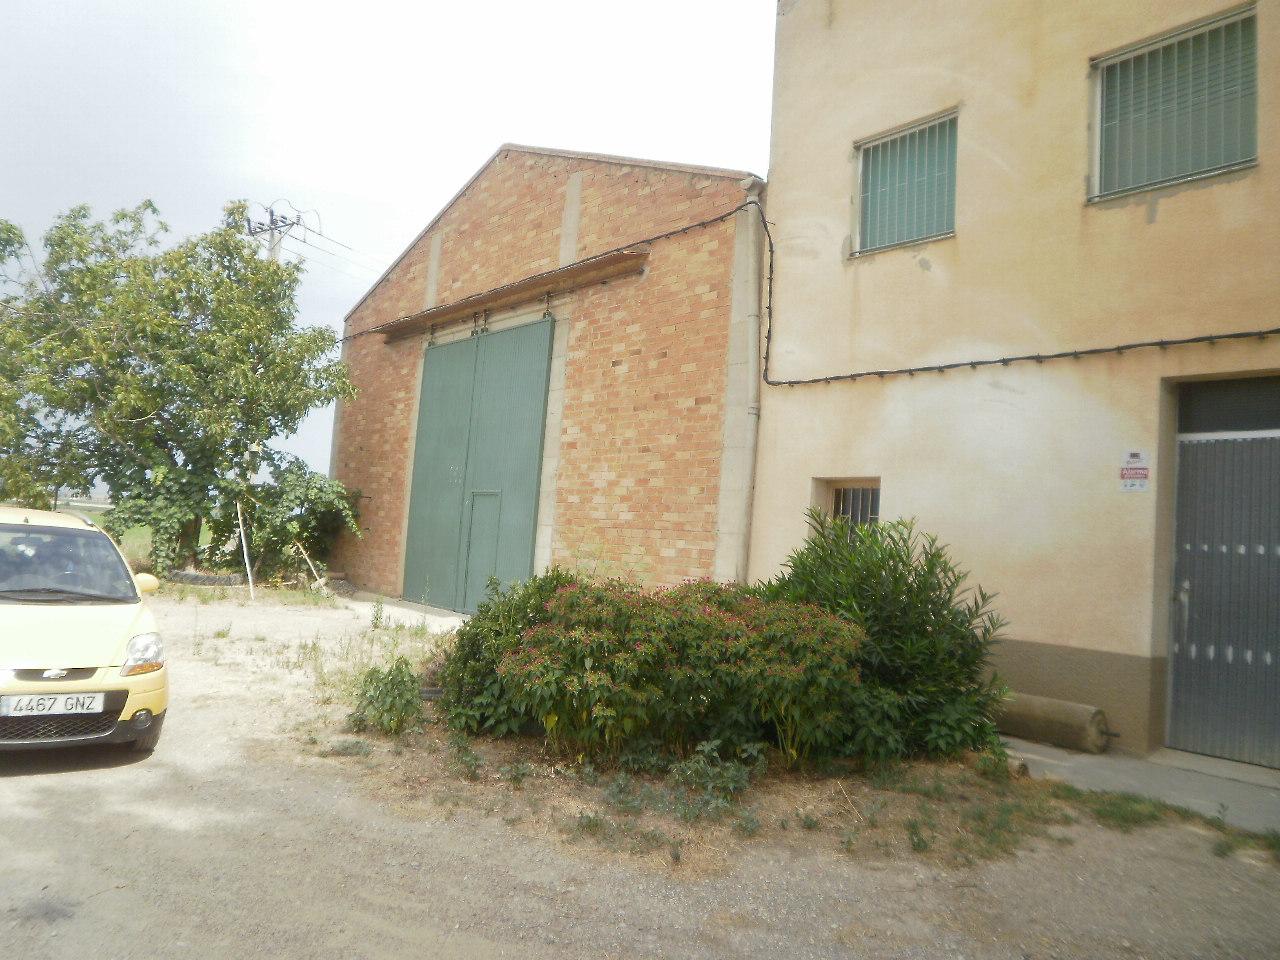 Casa  Calle torre xixons. Casa de pueblo sobre parcela de 2229 m2 con un almacen de 315 m2